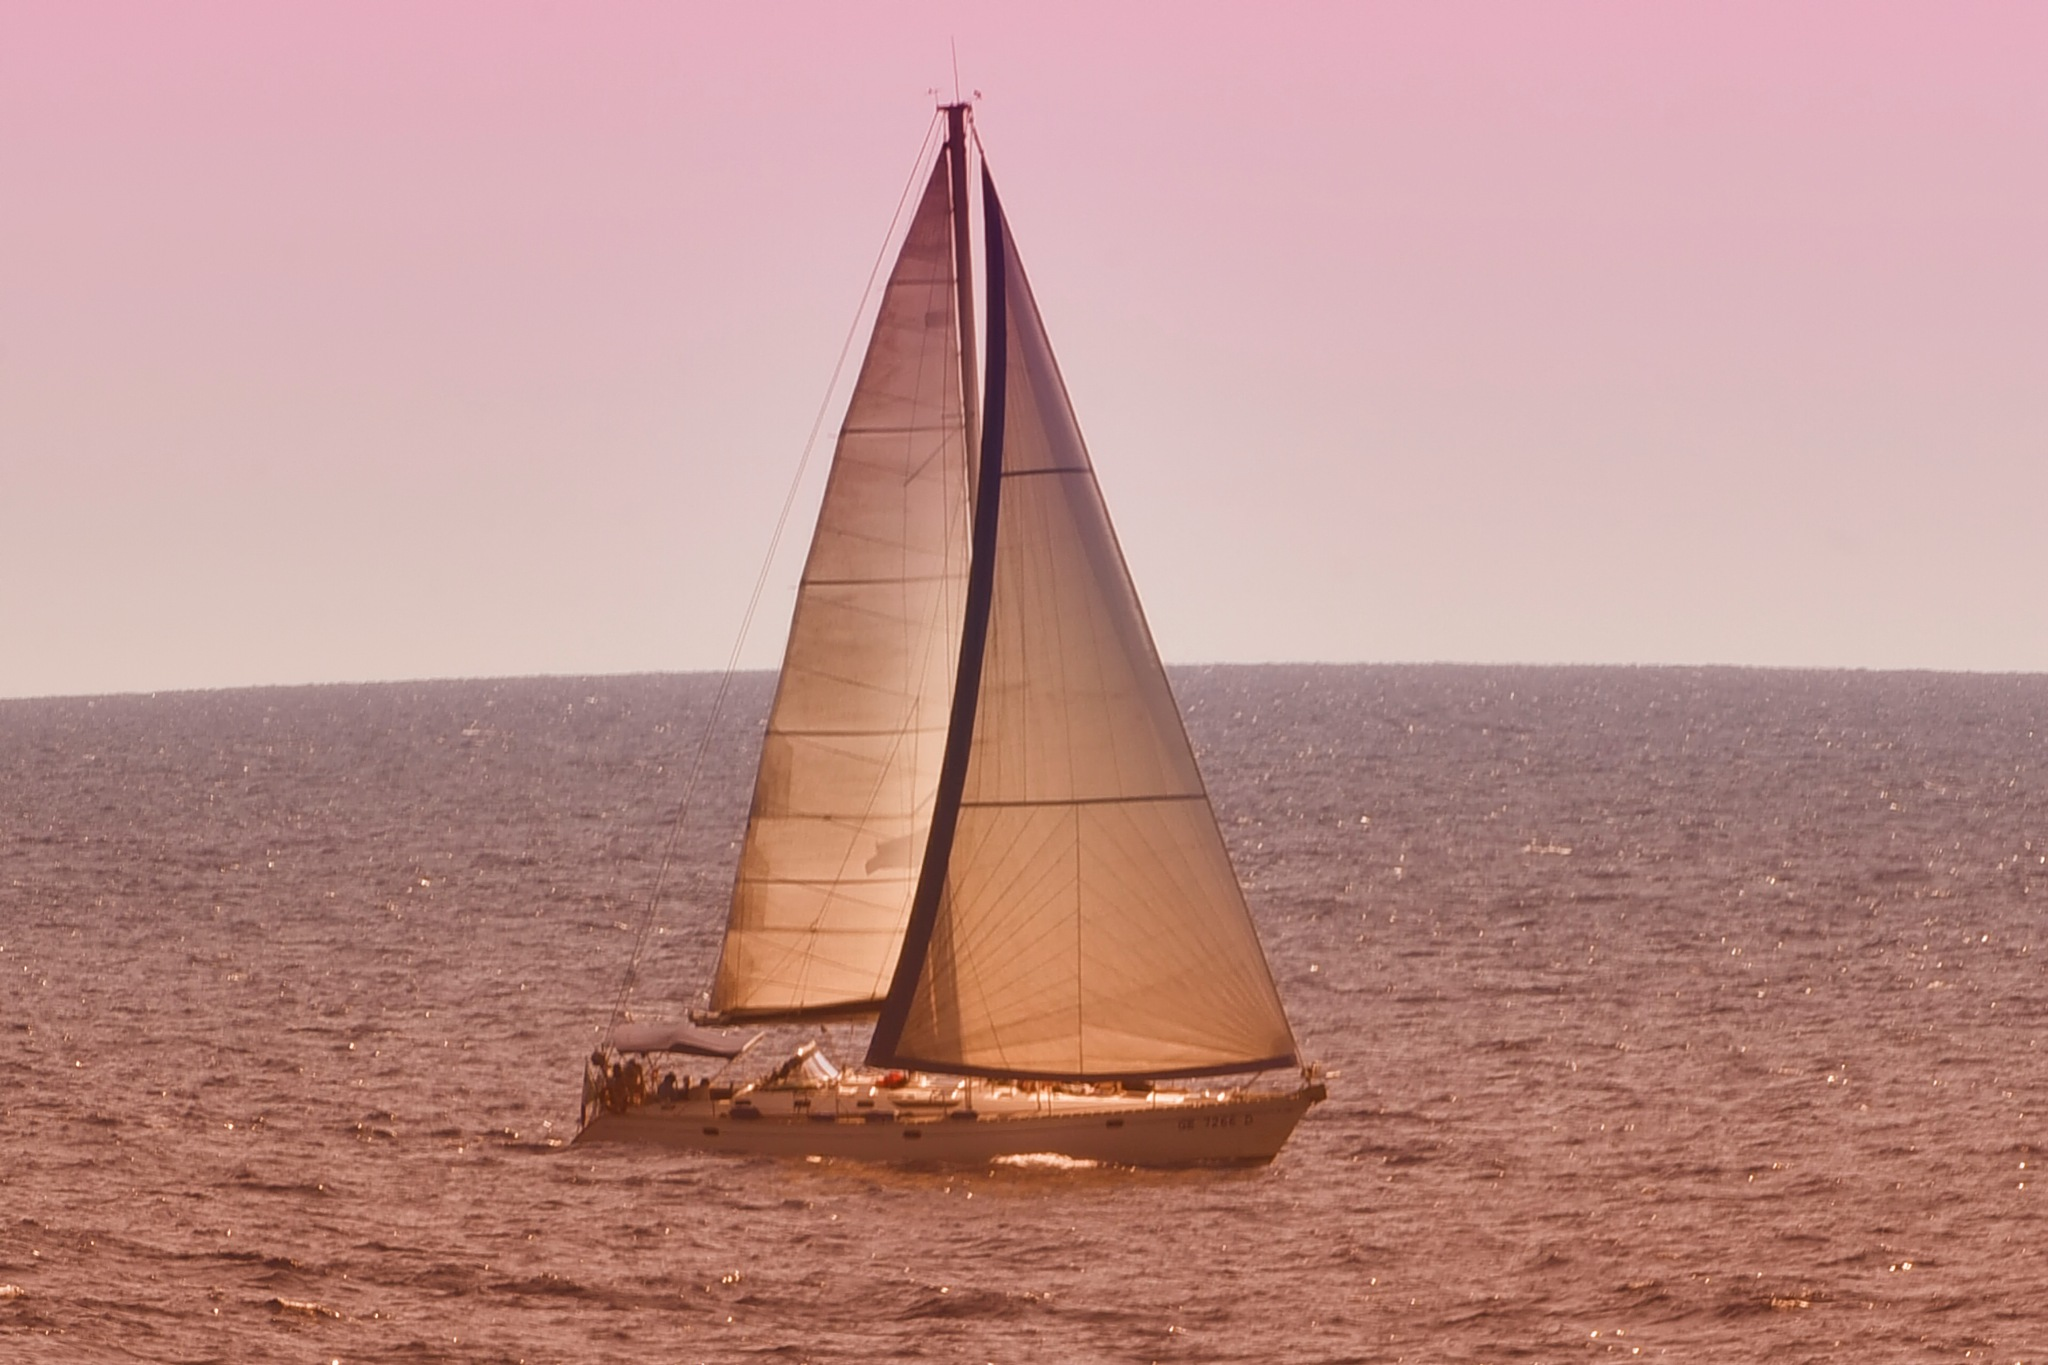 sail in sea by sunrisesunset